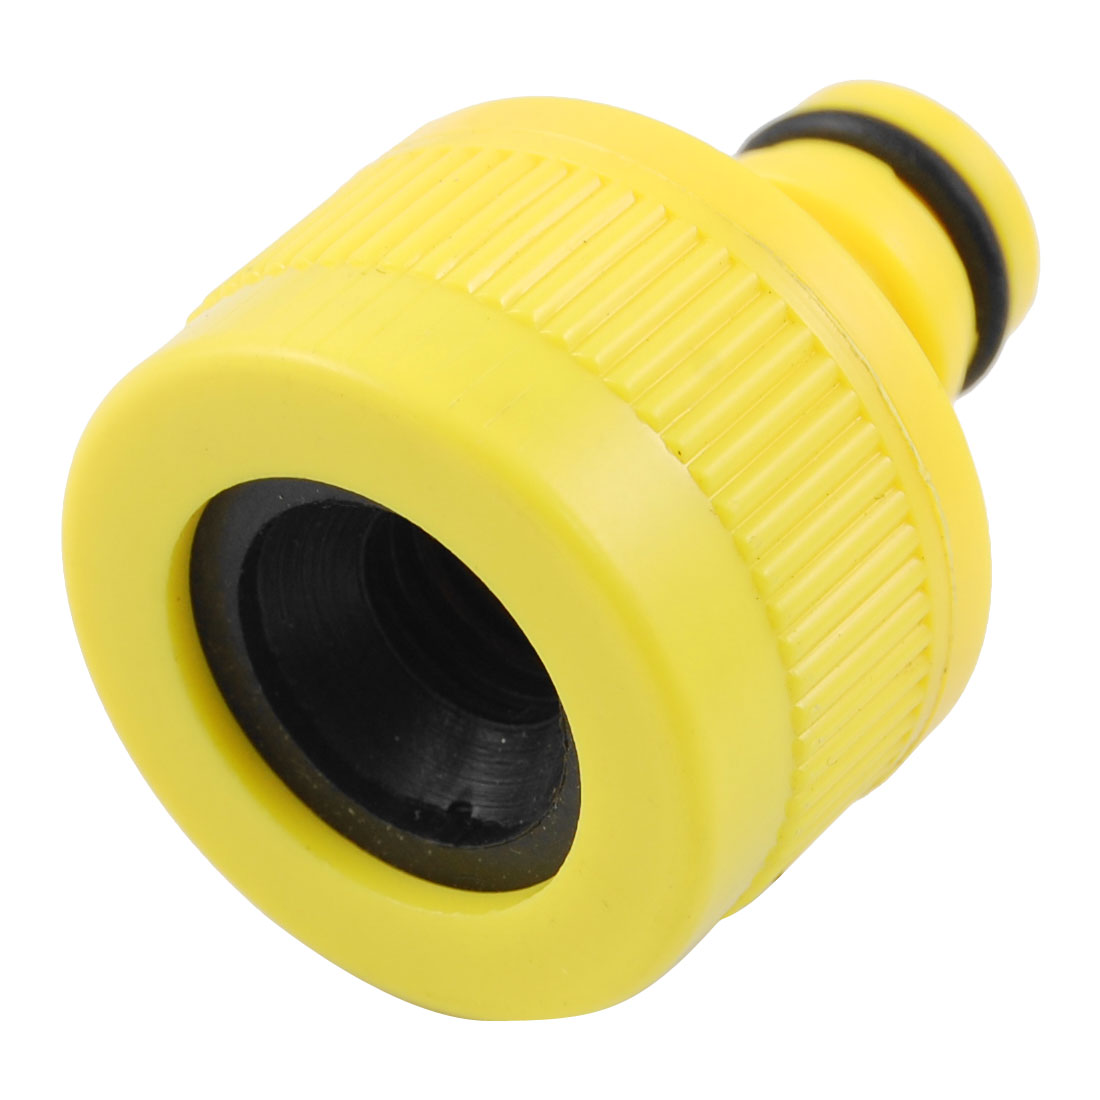 "Unique Bargains 33/64"" Dia Female Thread Yellow Garden Spray Hose Nozzle Adapter"